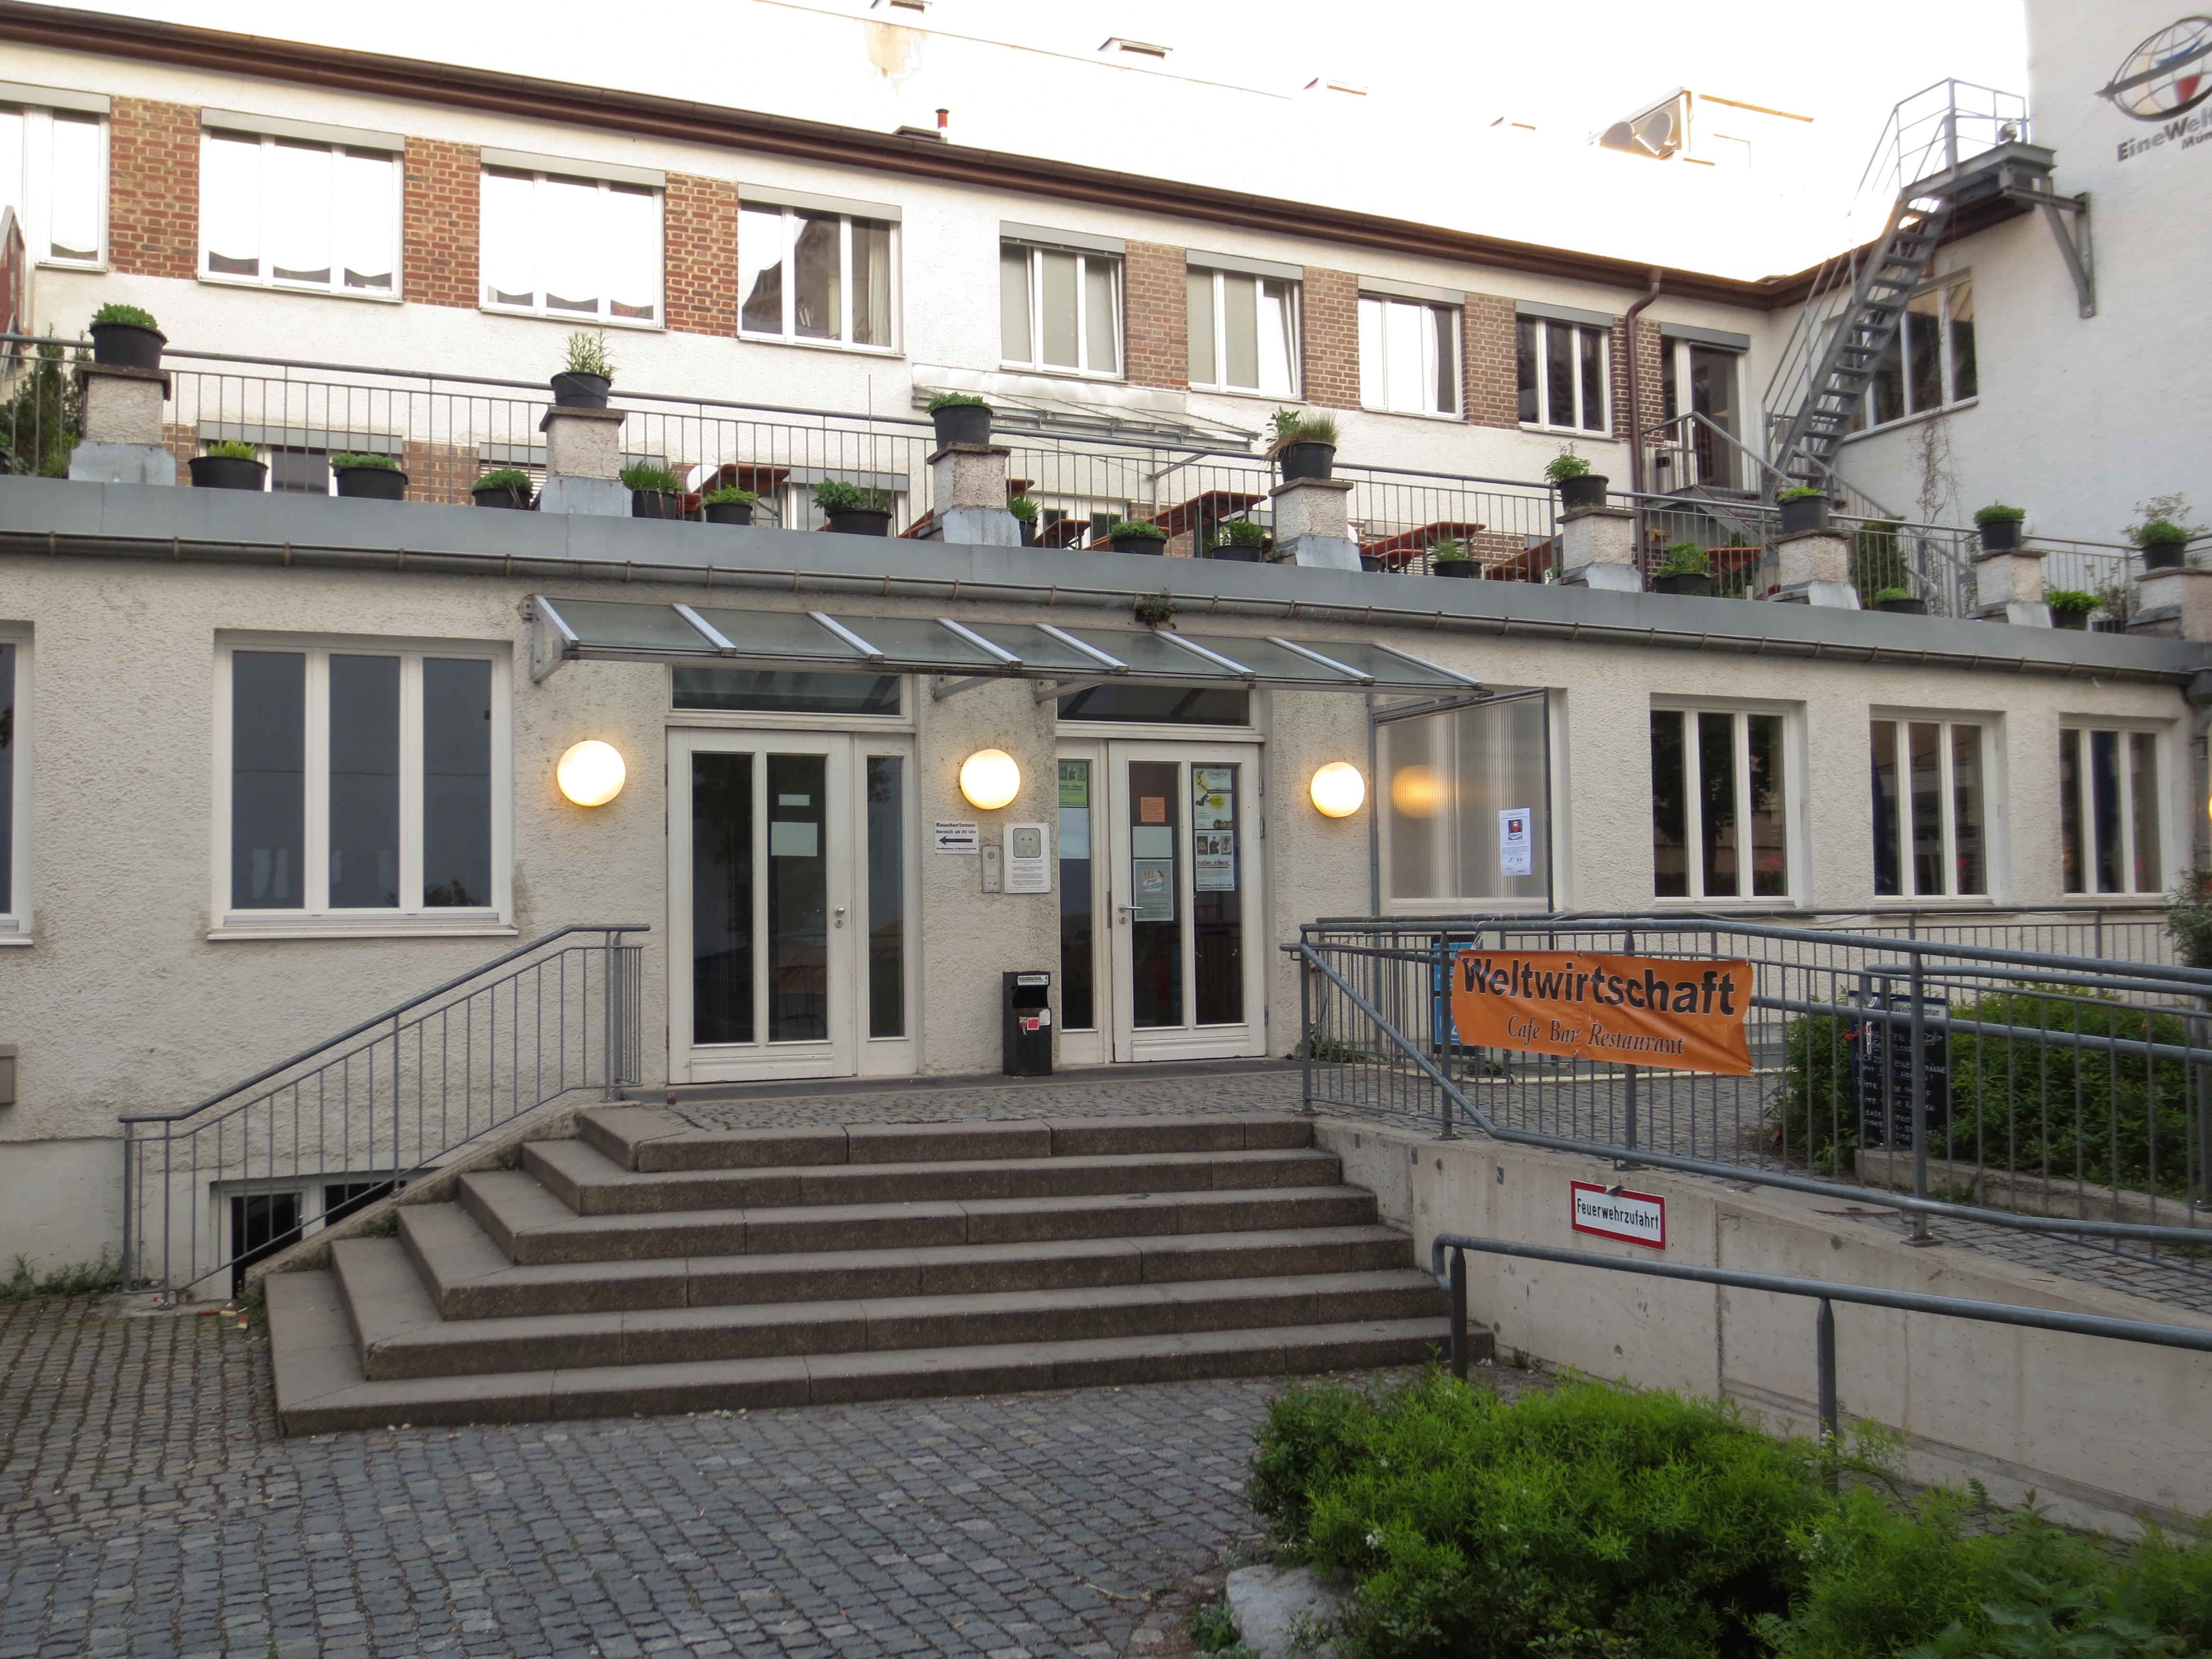 File:Eine Welt Haus München 001.jpg - Wikimedia Commons size: 4587 x 3440 post ID: 7 File size: 0 B